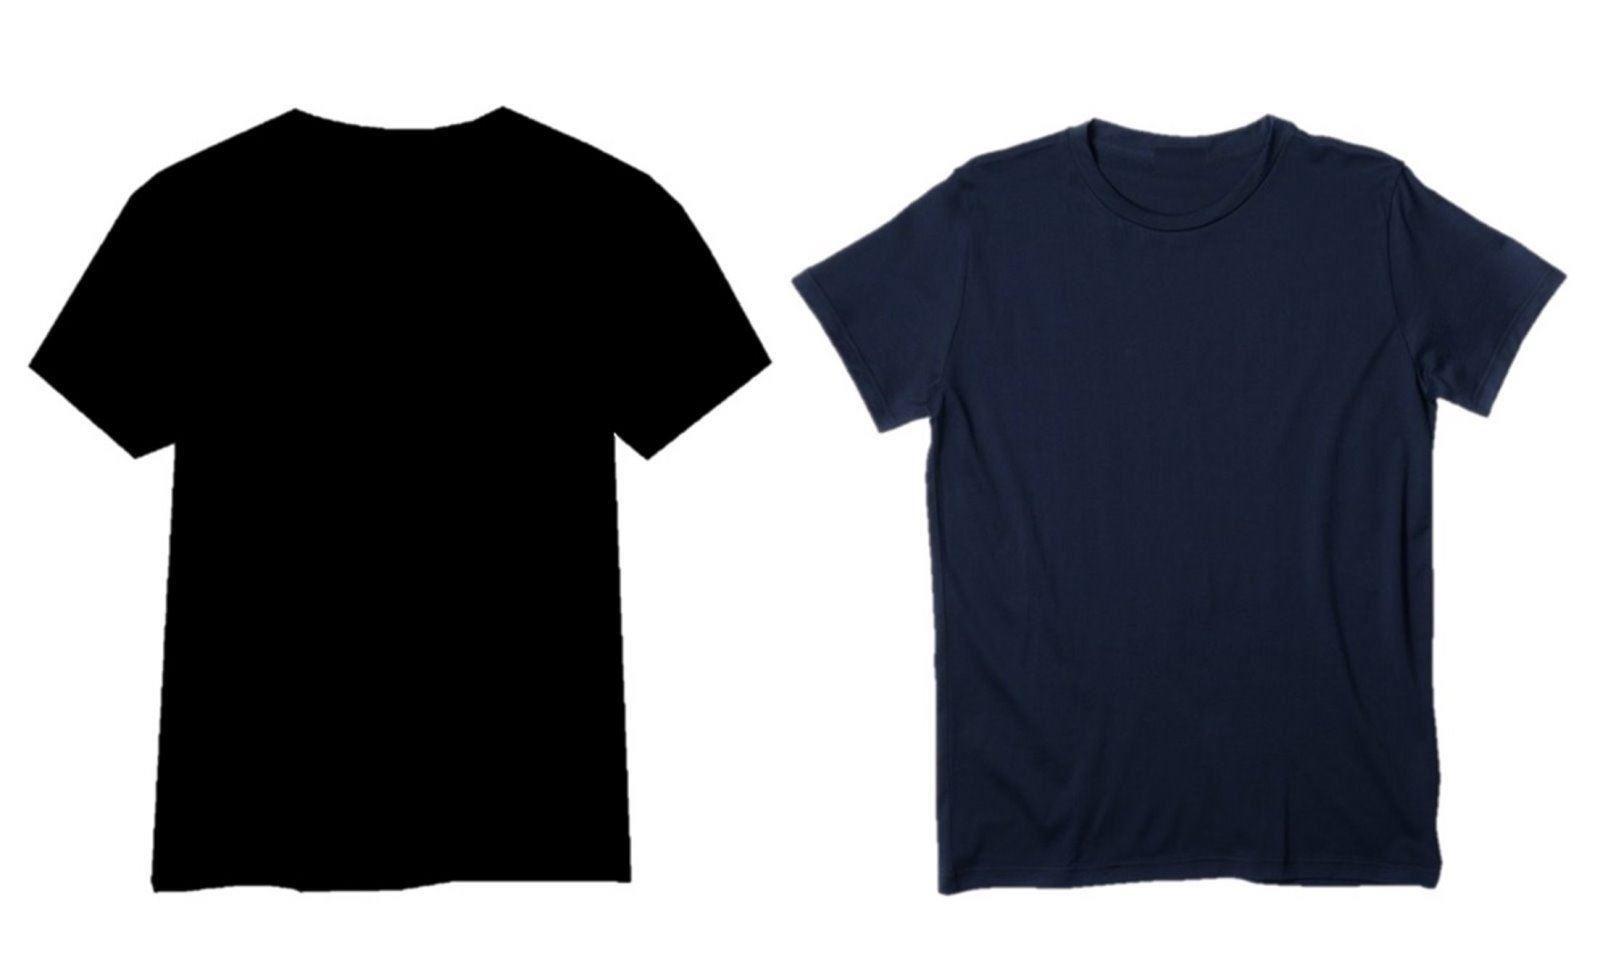 big mens t shirt tee polo king size 3xl 4xl 5xl 6xl twin pack ebay. Black Bedroom Furniture Sets. Home Design Ideas